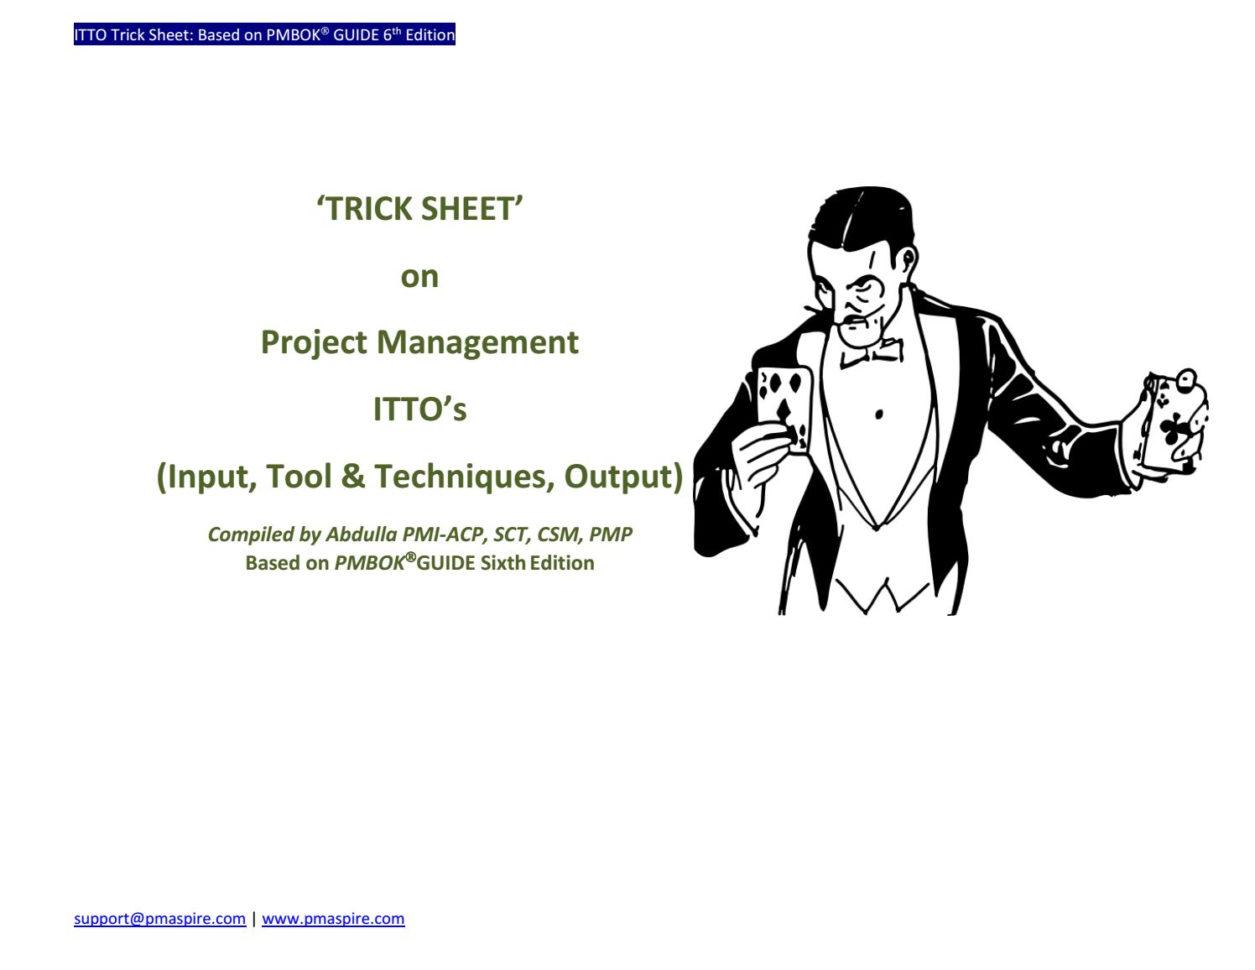 Itto Spreadsheet 6Th Edition 2 Printable Spreadshee itto